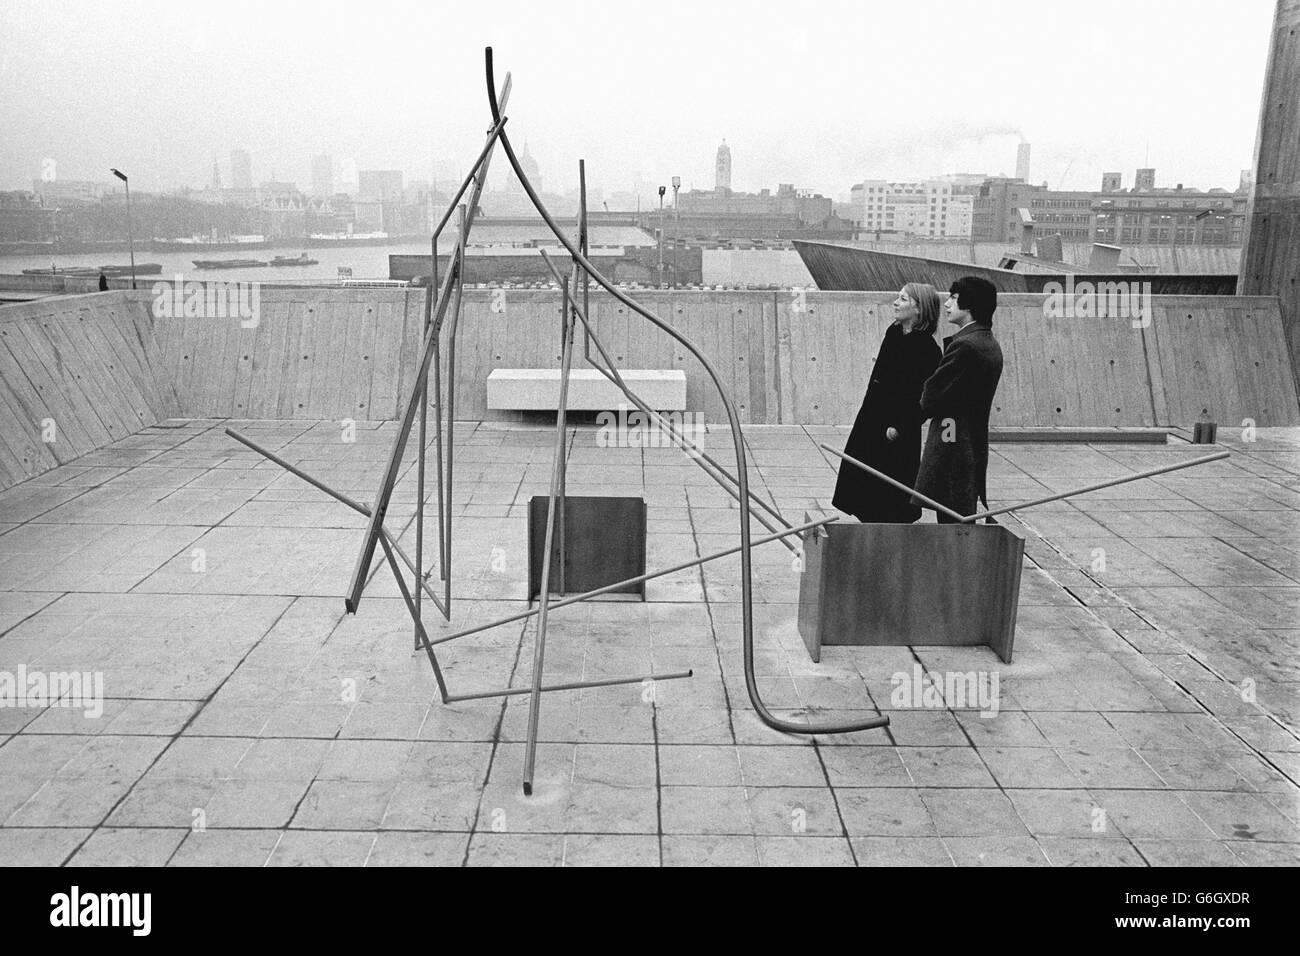 Art - Anthony Caro Retrospective Exhibition - Hayward Gallery, London - Stock Image